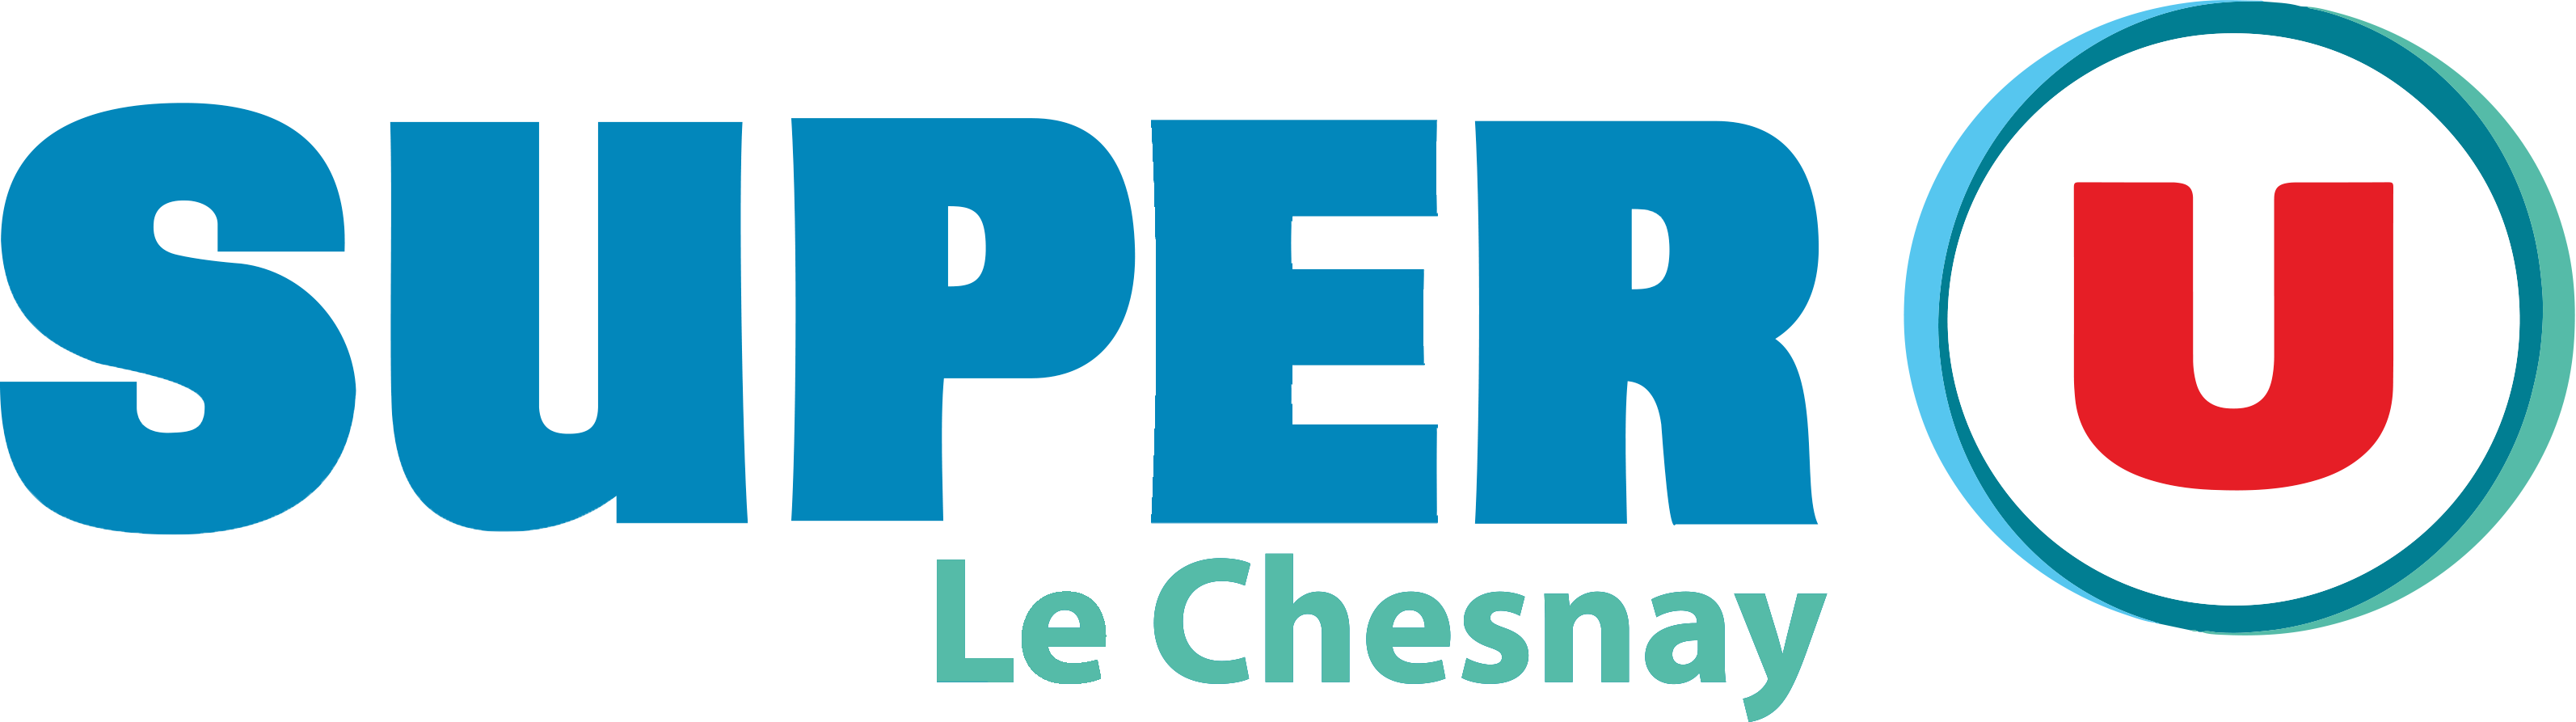 Super U Le Chesnay.png